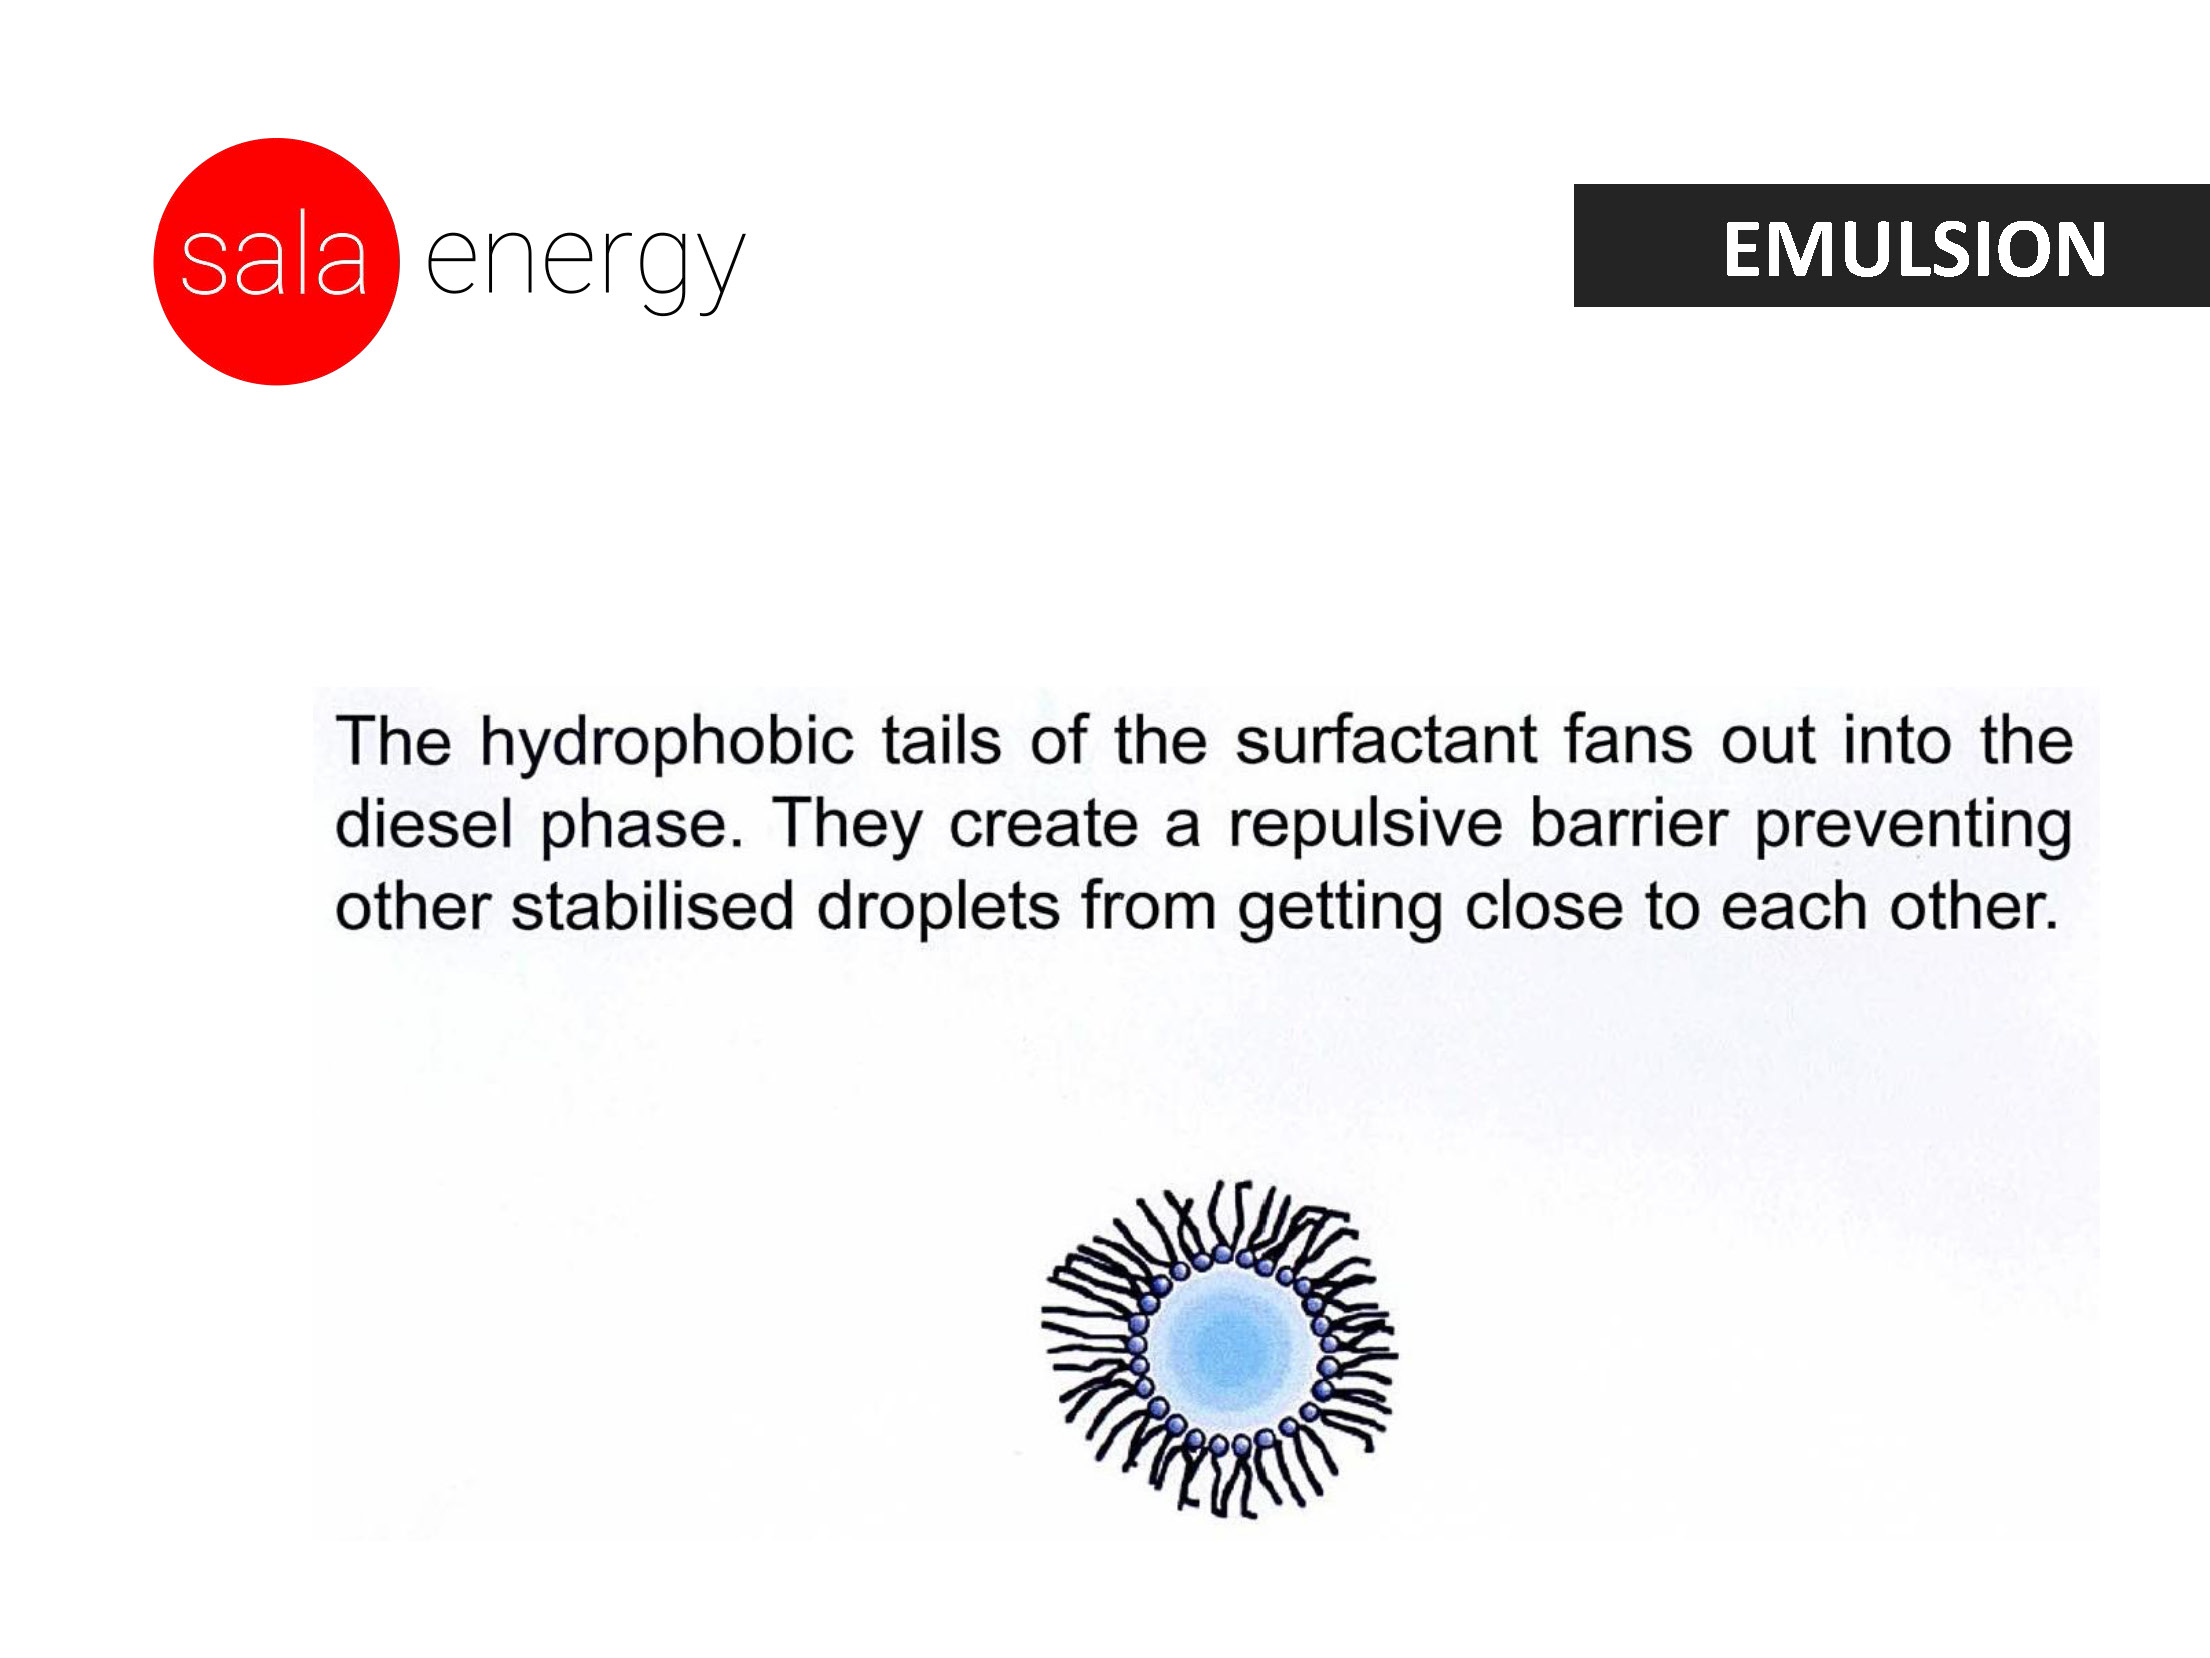 SALA Diesel emulsion 2017_Page_15